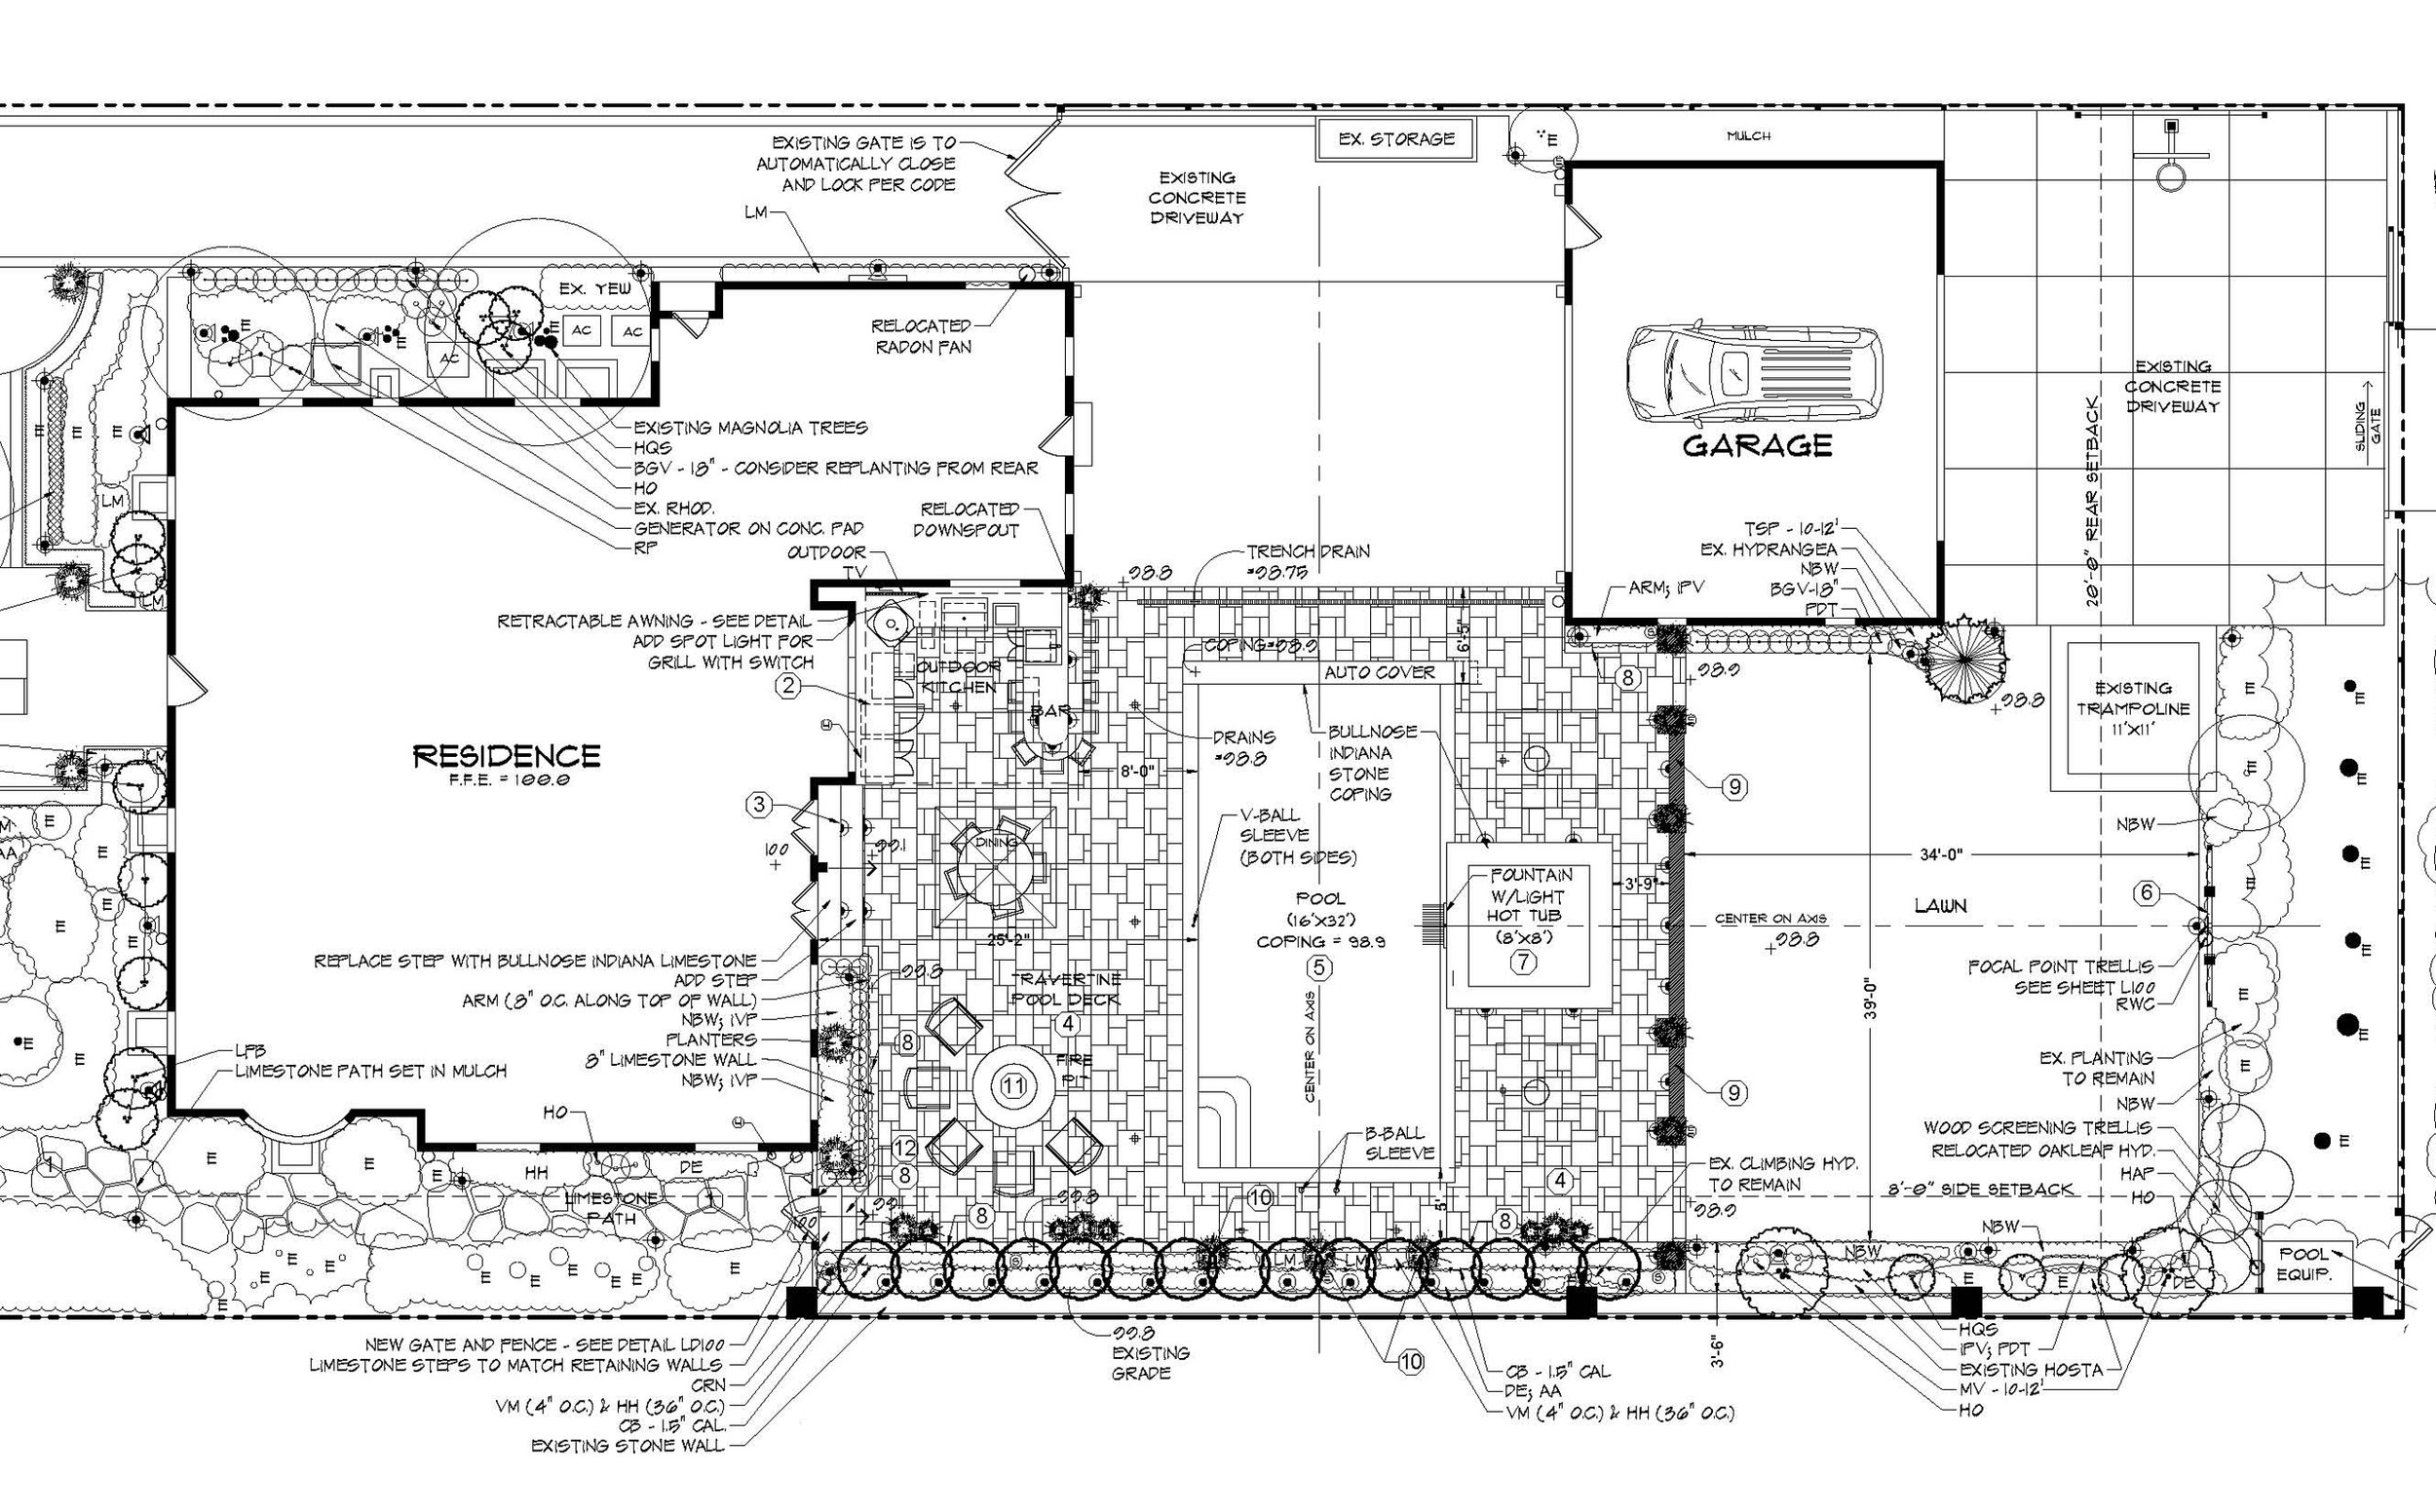 Bexley landscape Architect Design.jpg